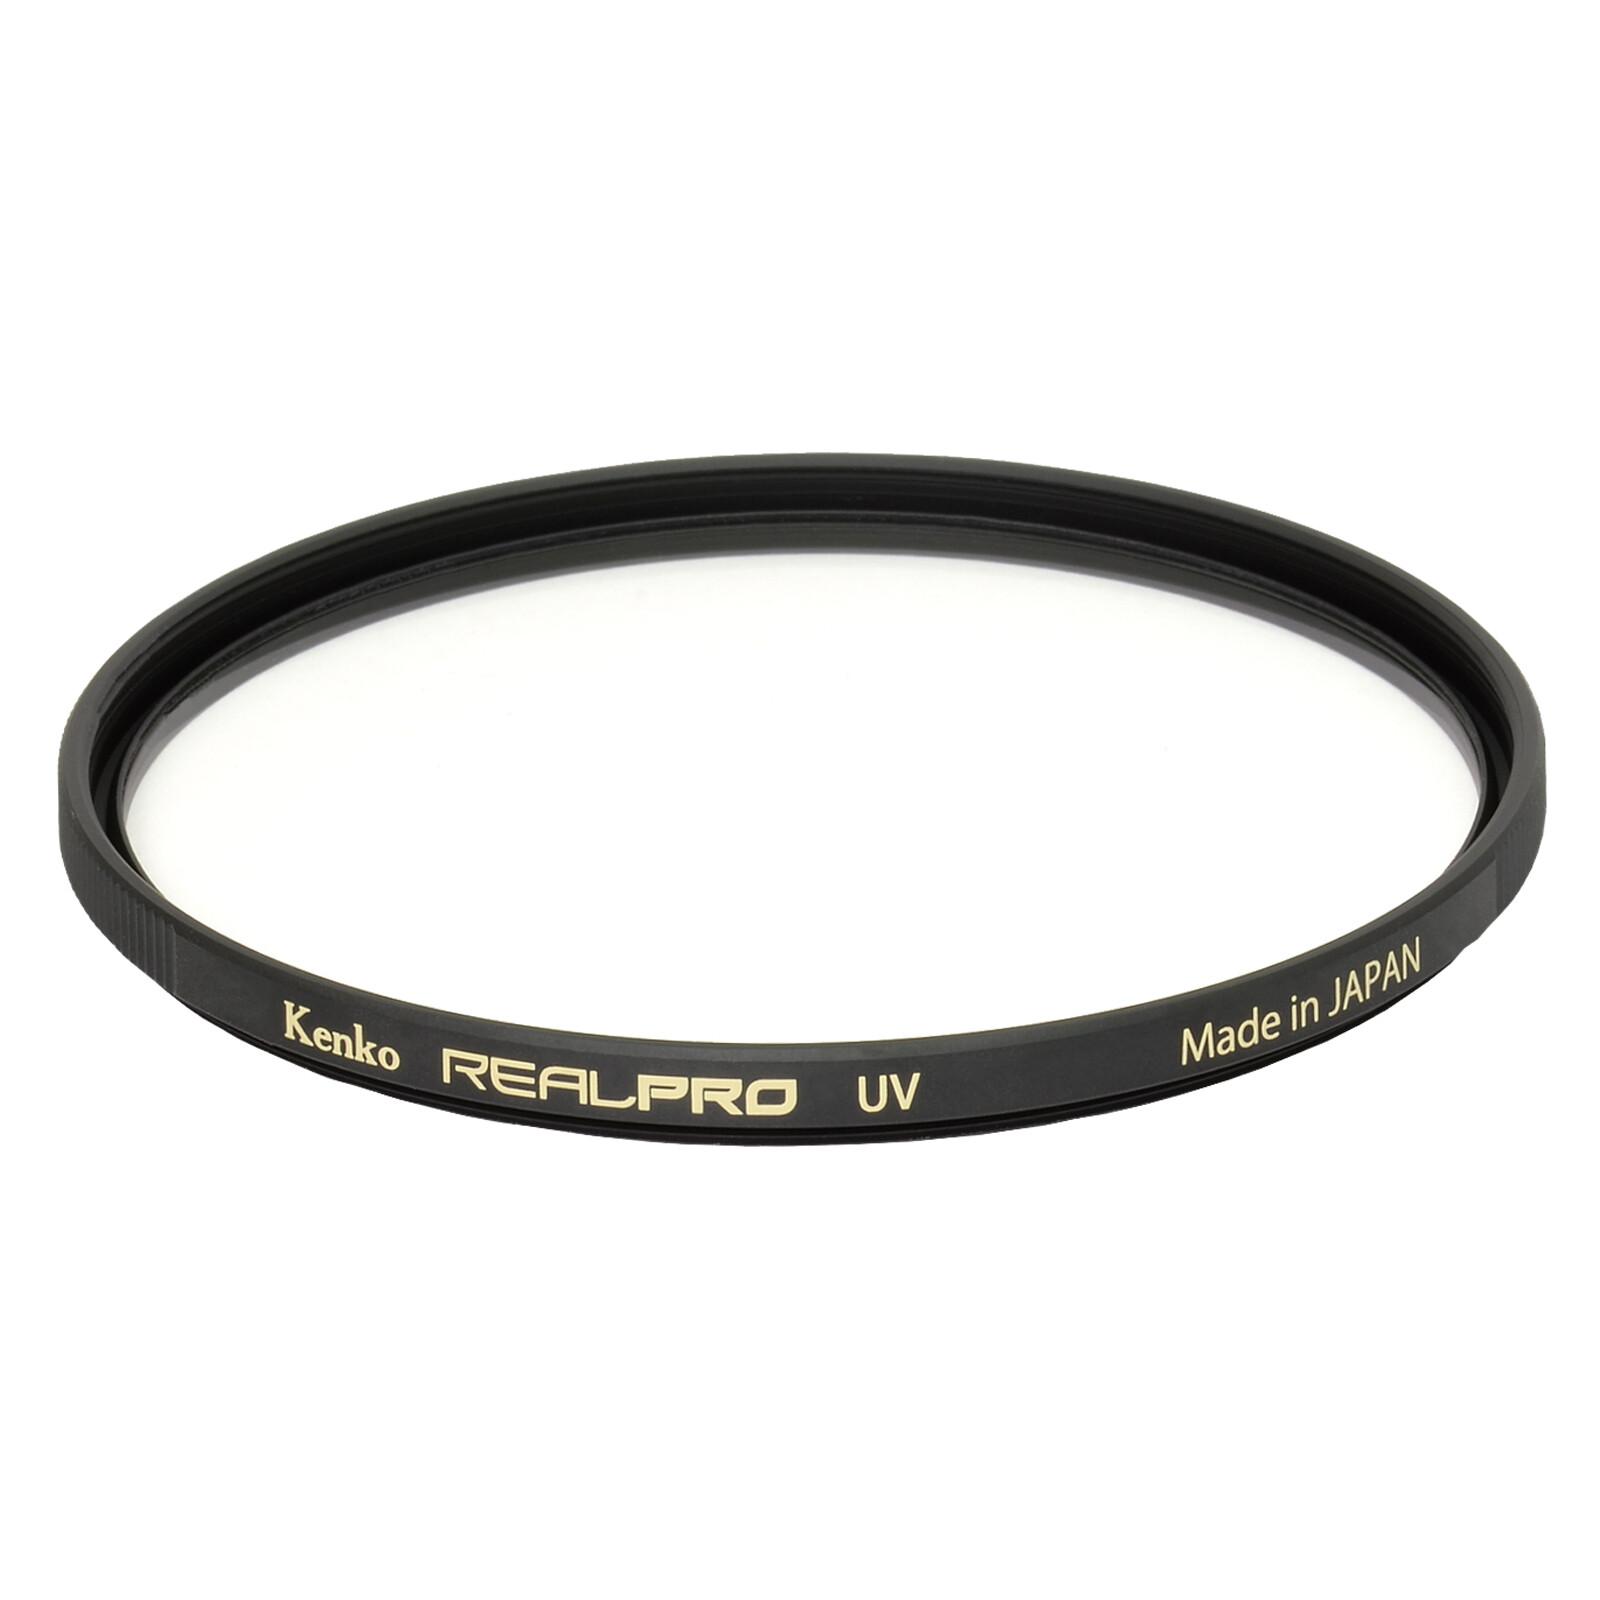 Kenko Real Pro UV 77mm Slim